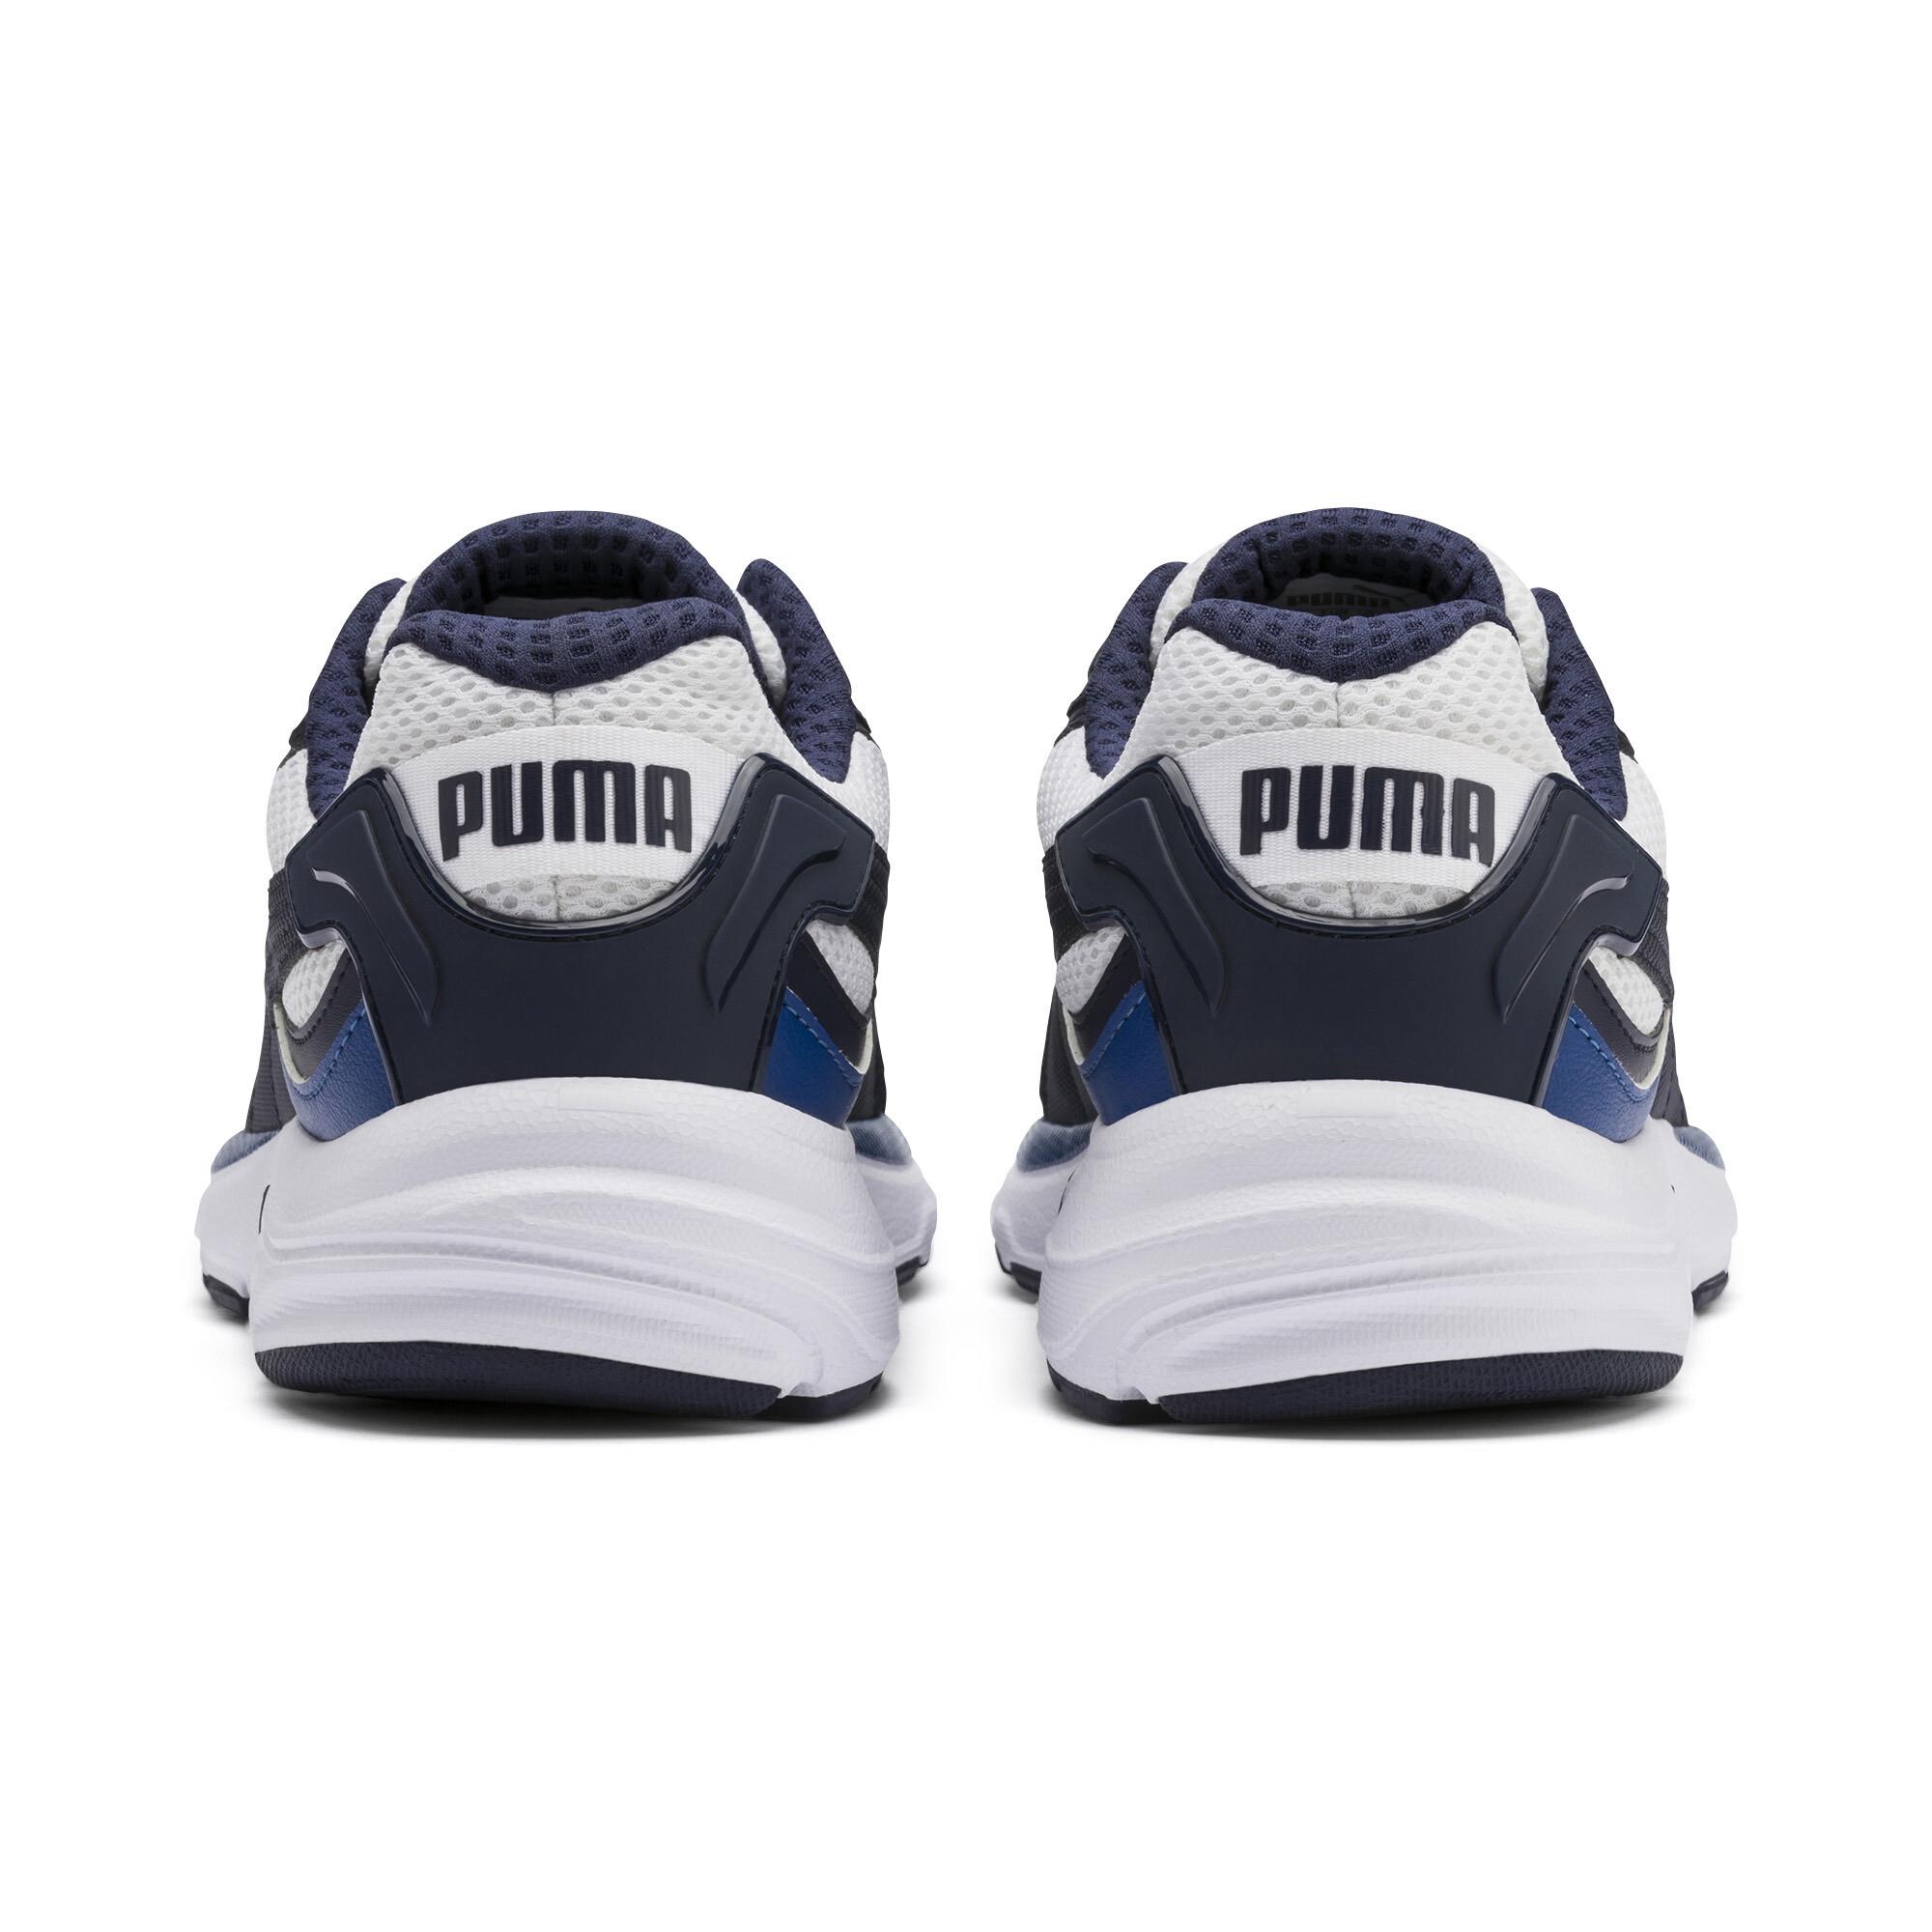 PUMA-Axis-Plus-90s-Sneakers-Men-Shoe-Basics thumbnail 23